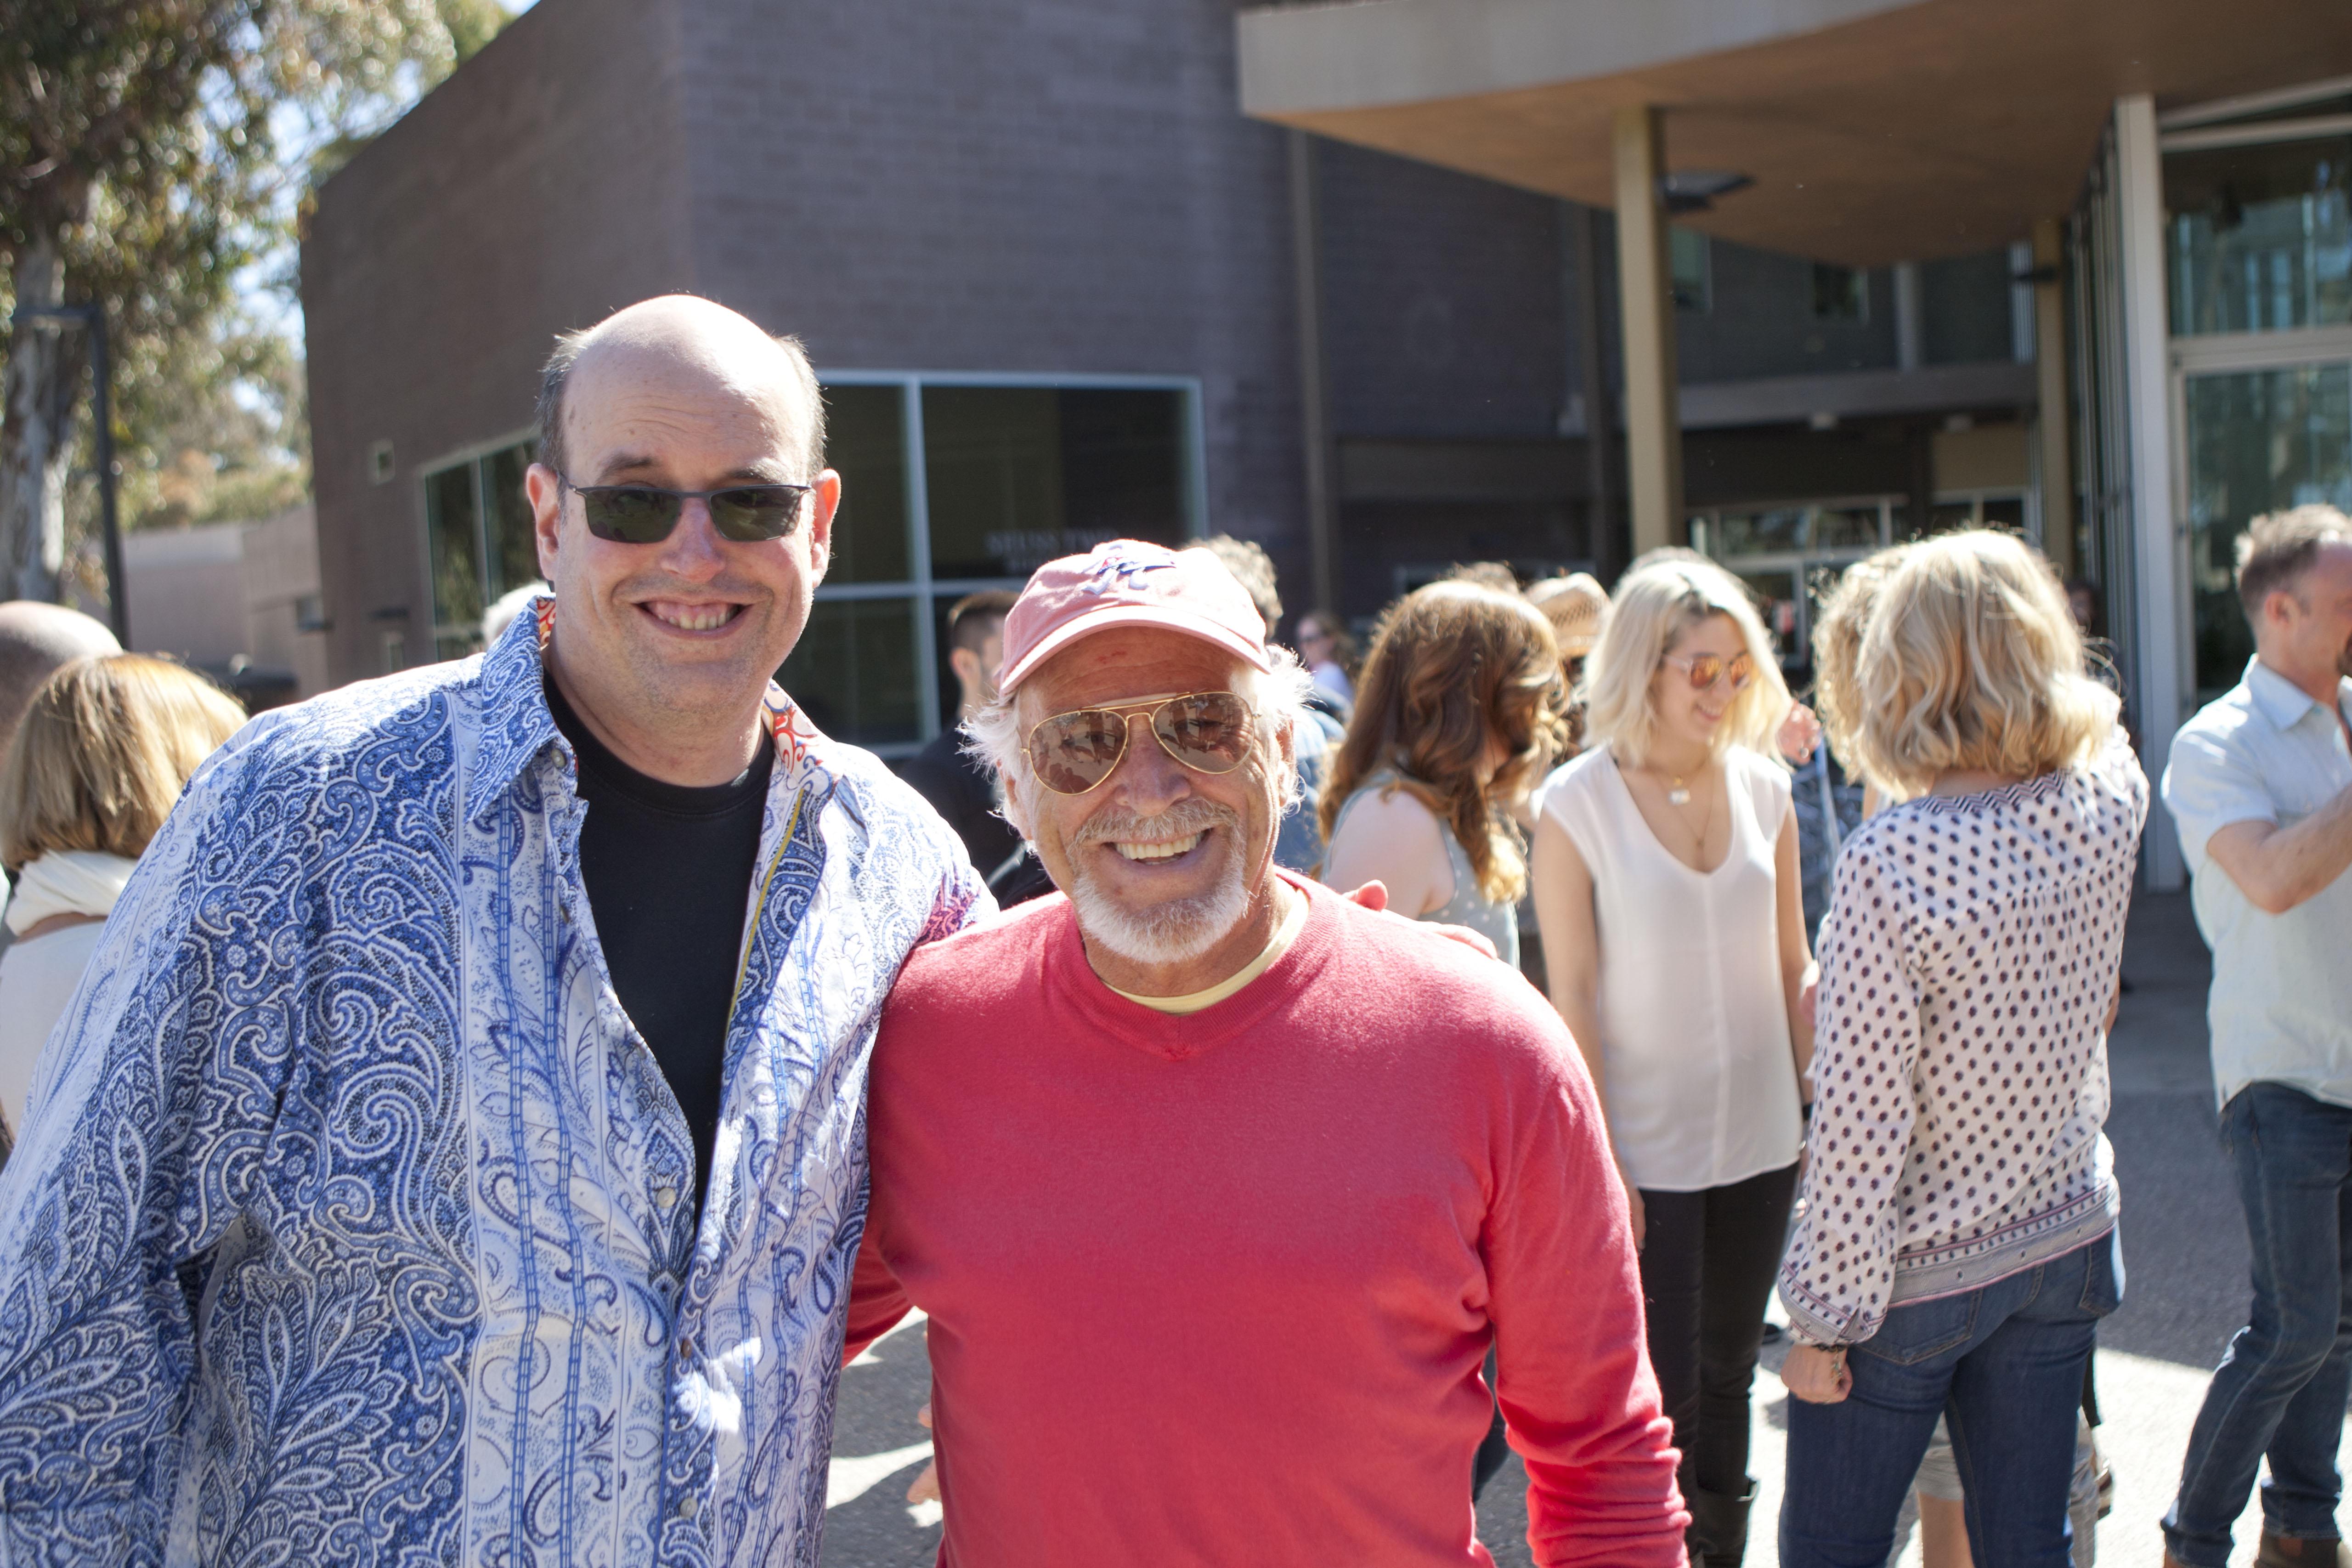 Christopher Ashley with Jimmy Buffett